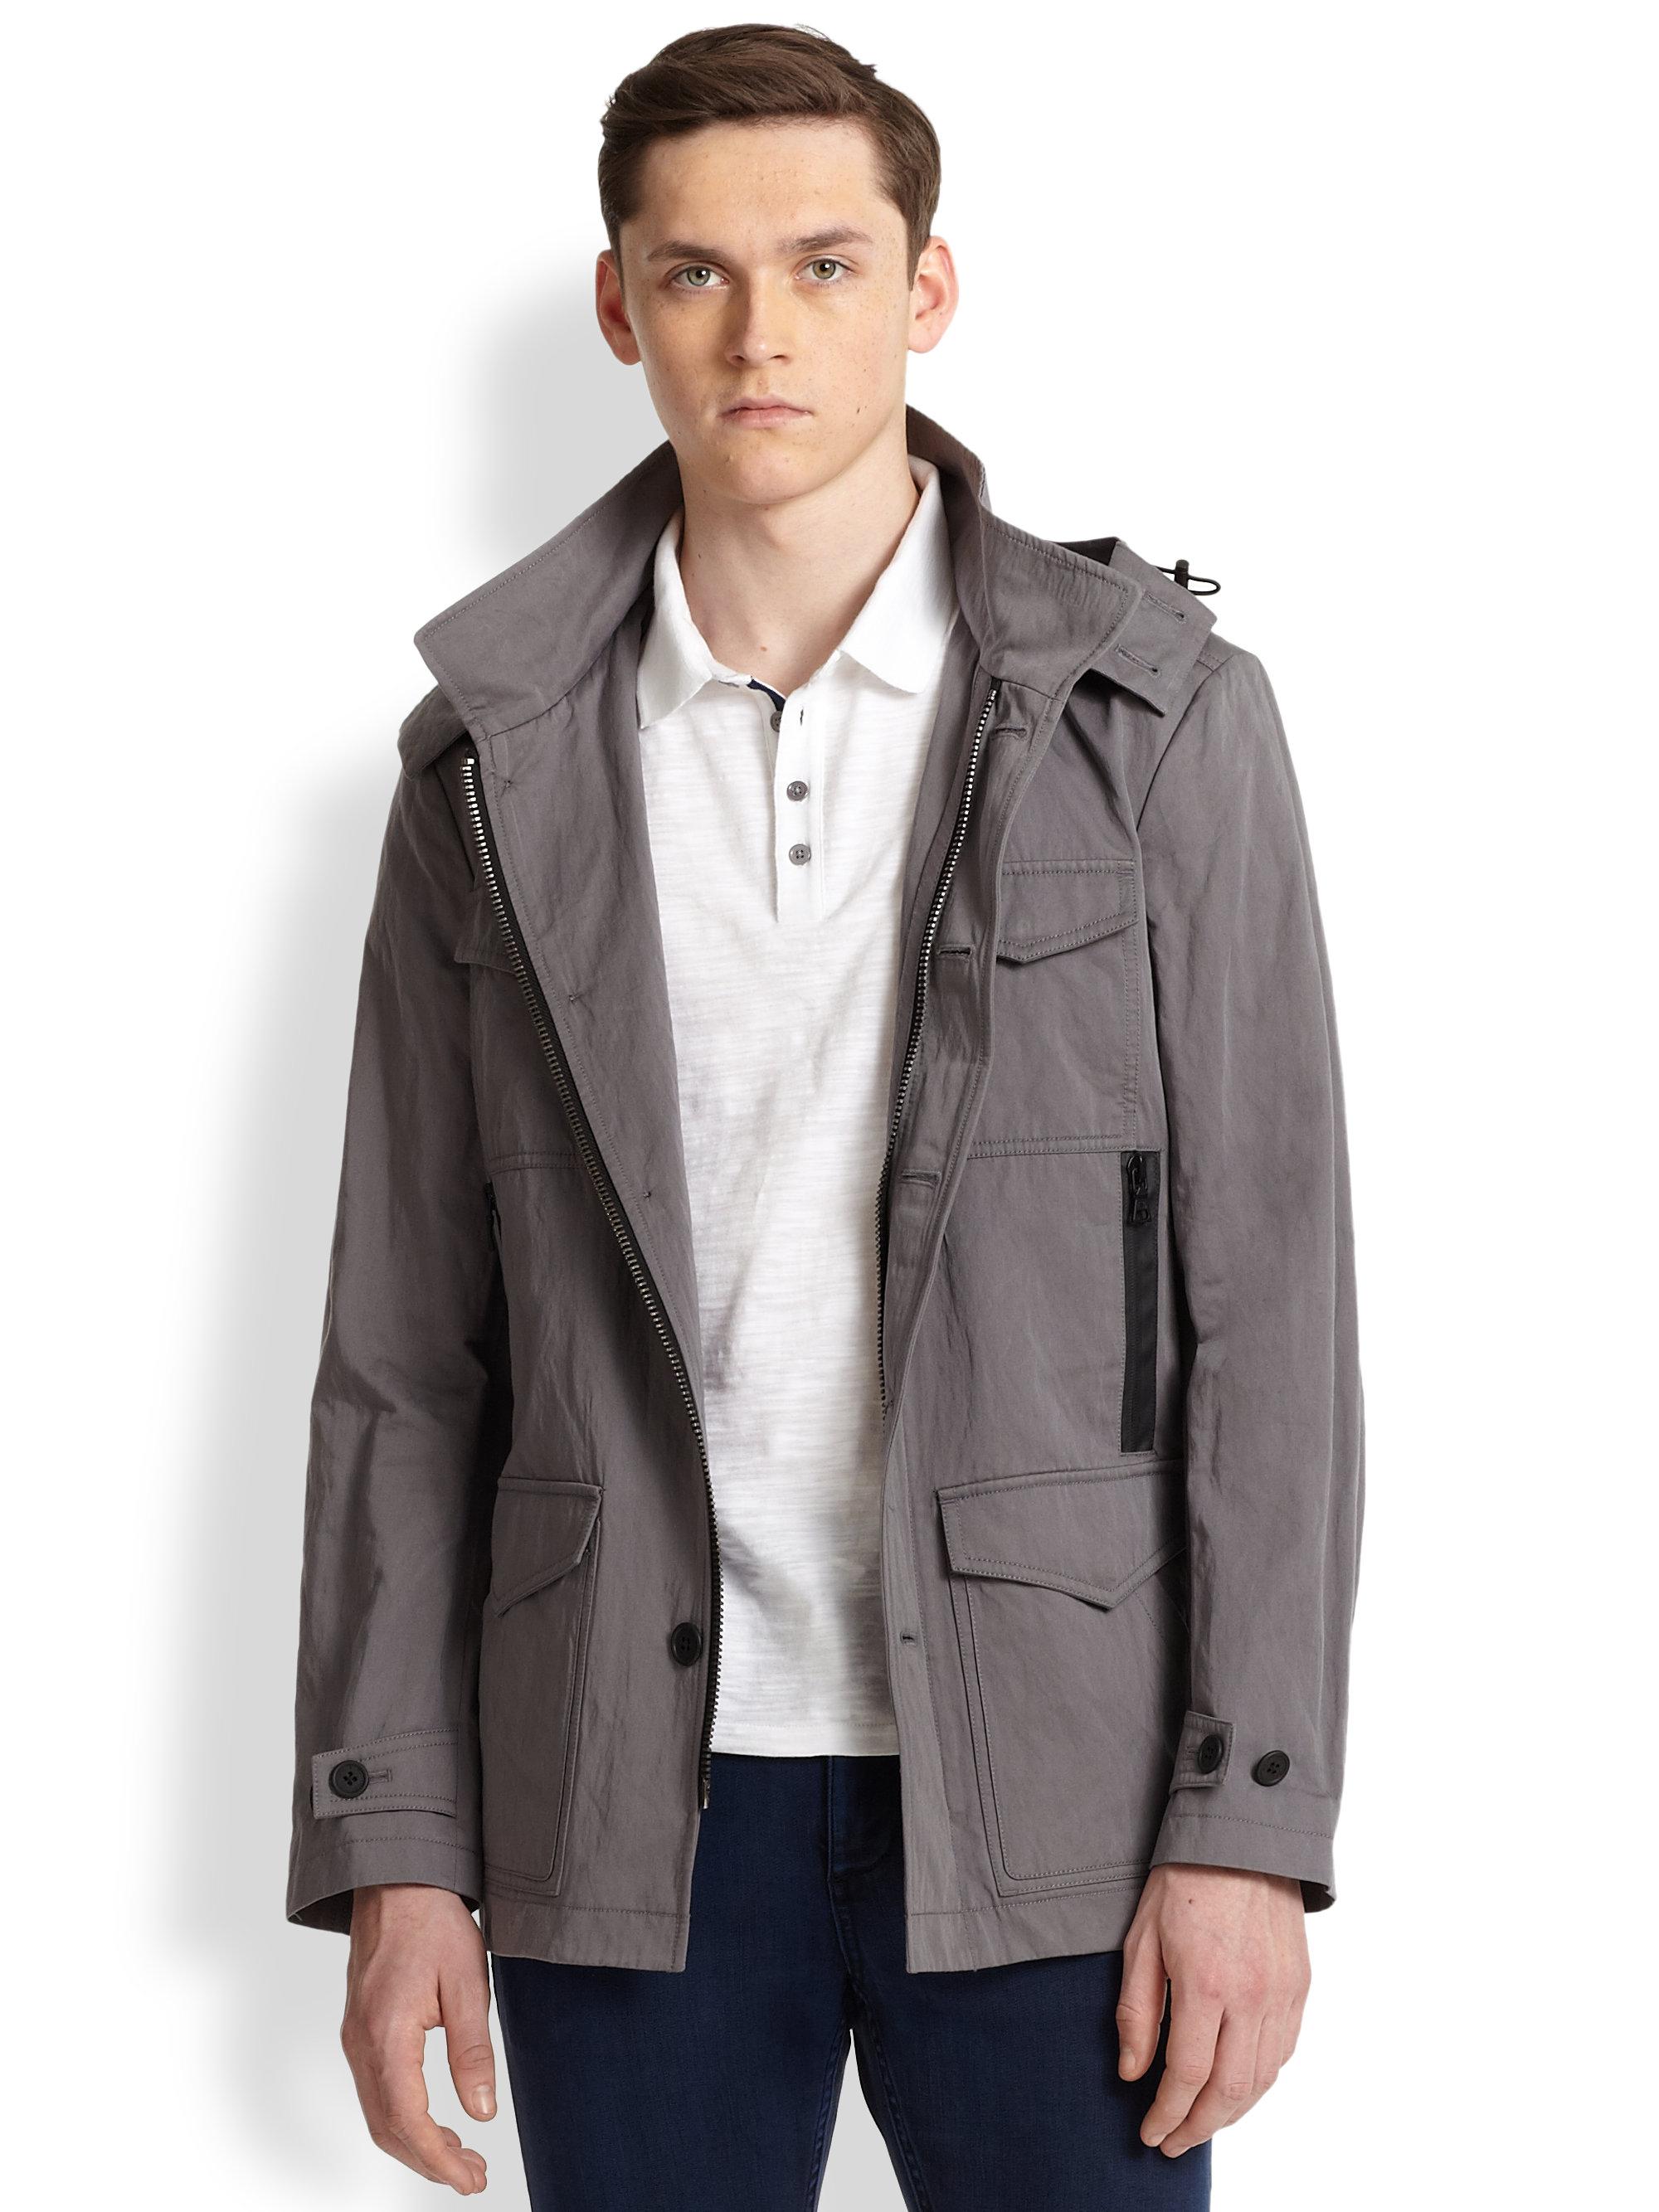 Elie tahari Hooded Anorak Jacket in Gray for Men | Lyst